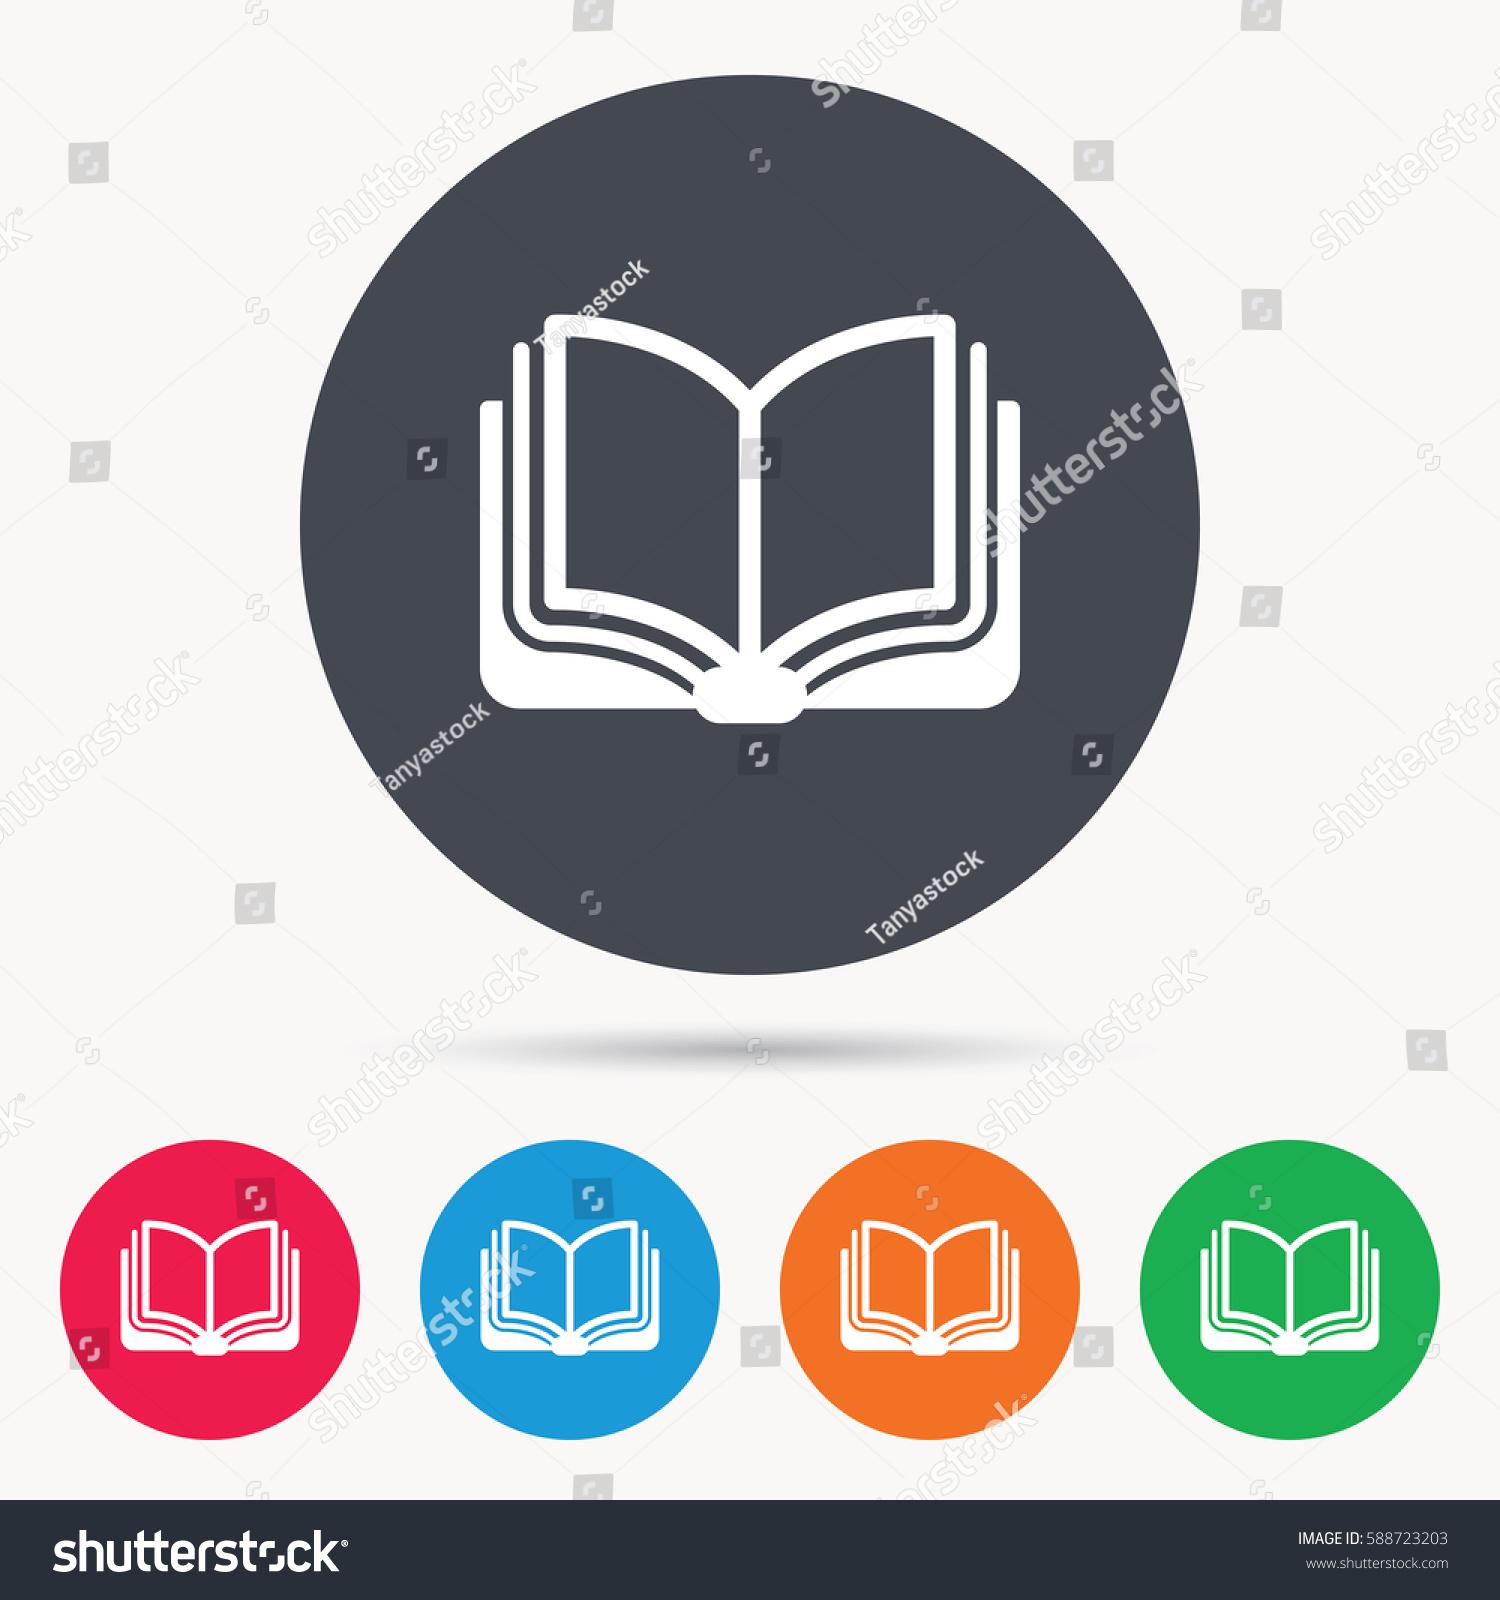 book icon study literature sign education stock illustration  book icon study literature sign education stock illustration 588723203 shutterstock